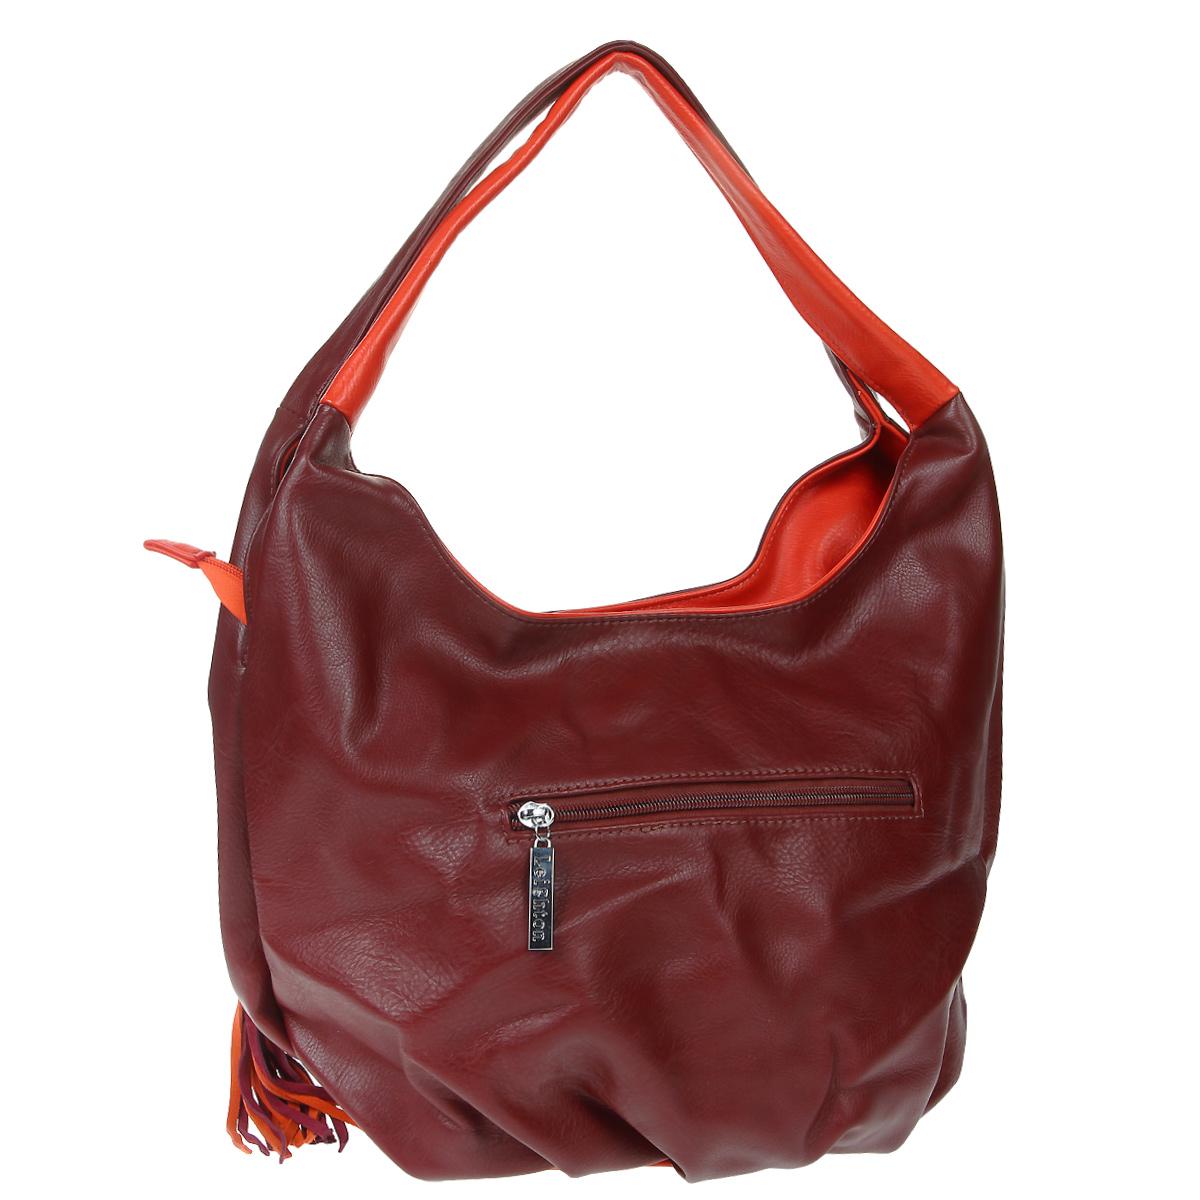 Сумка женская Leighton, цвет: бордовый. 76752-292 ( 76752-292/42/292/52/503/5 )